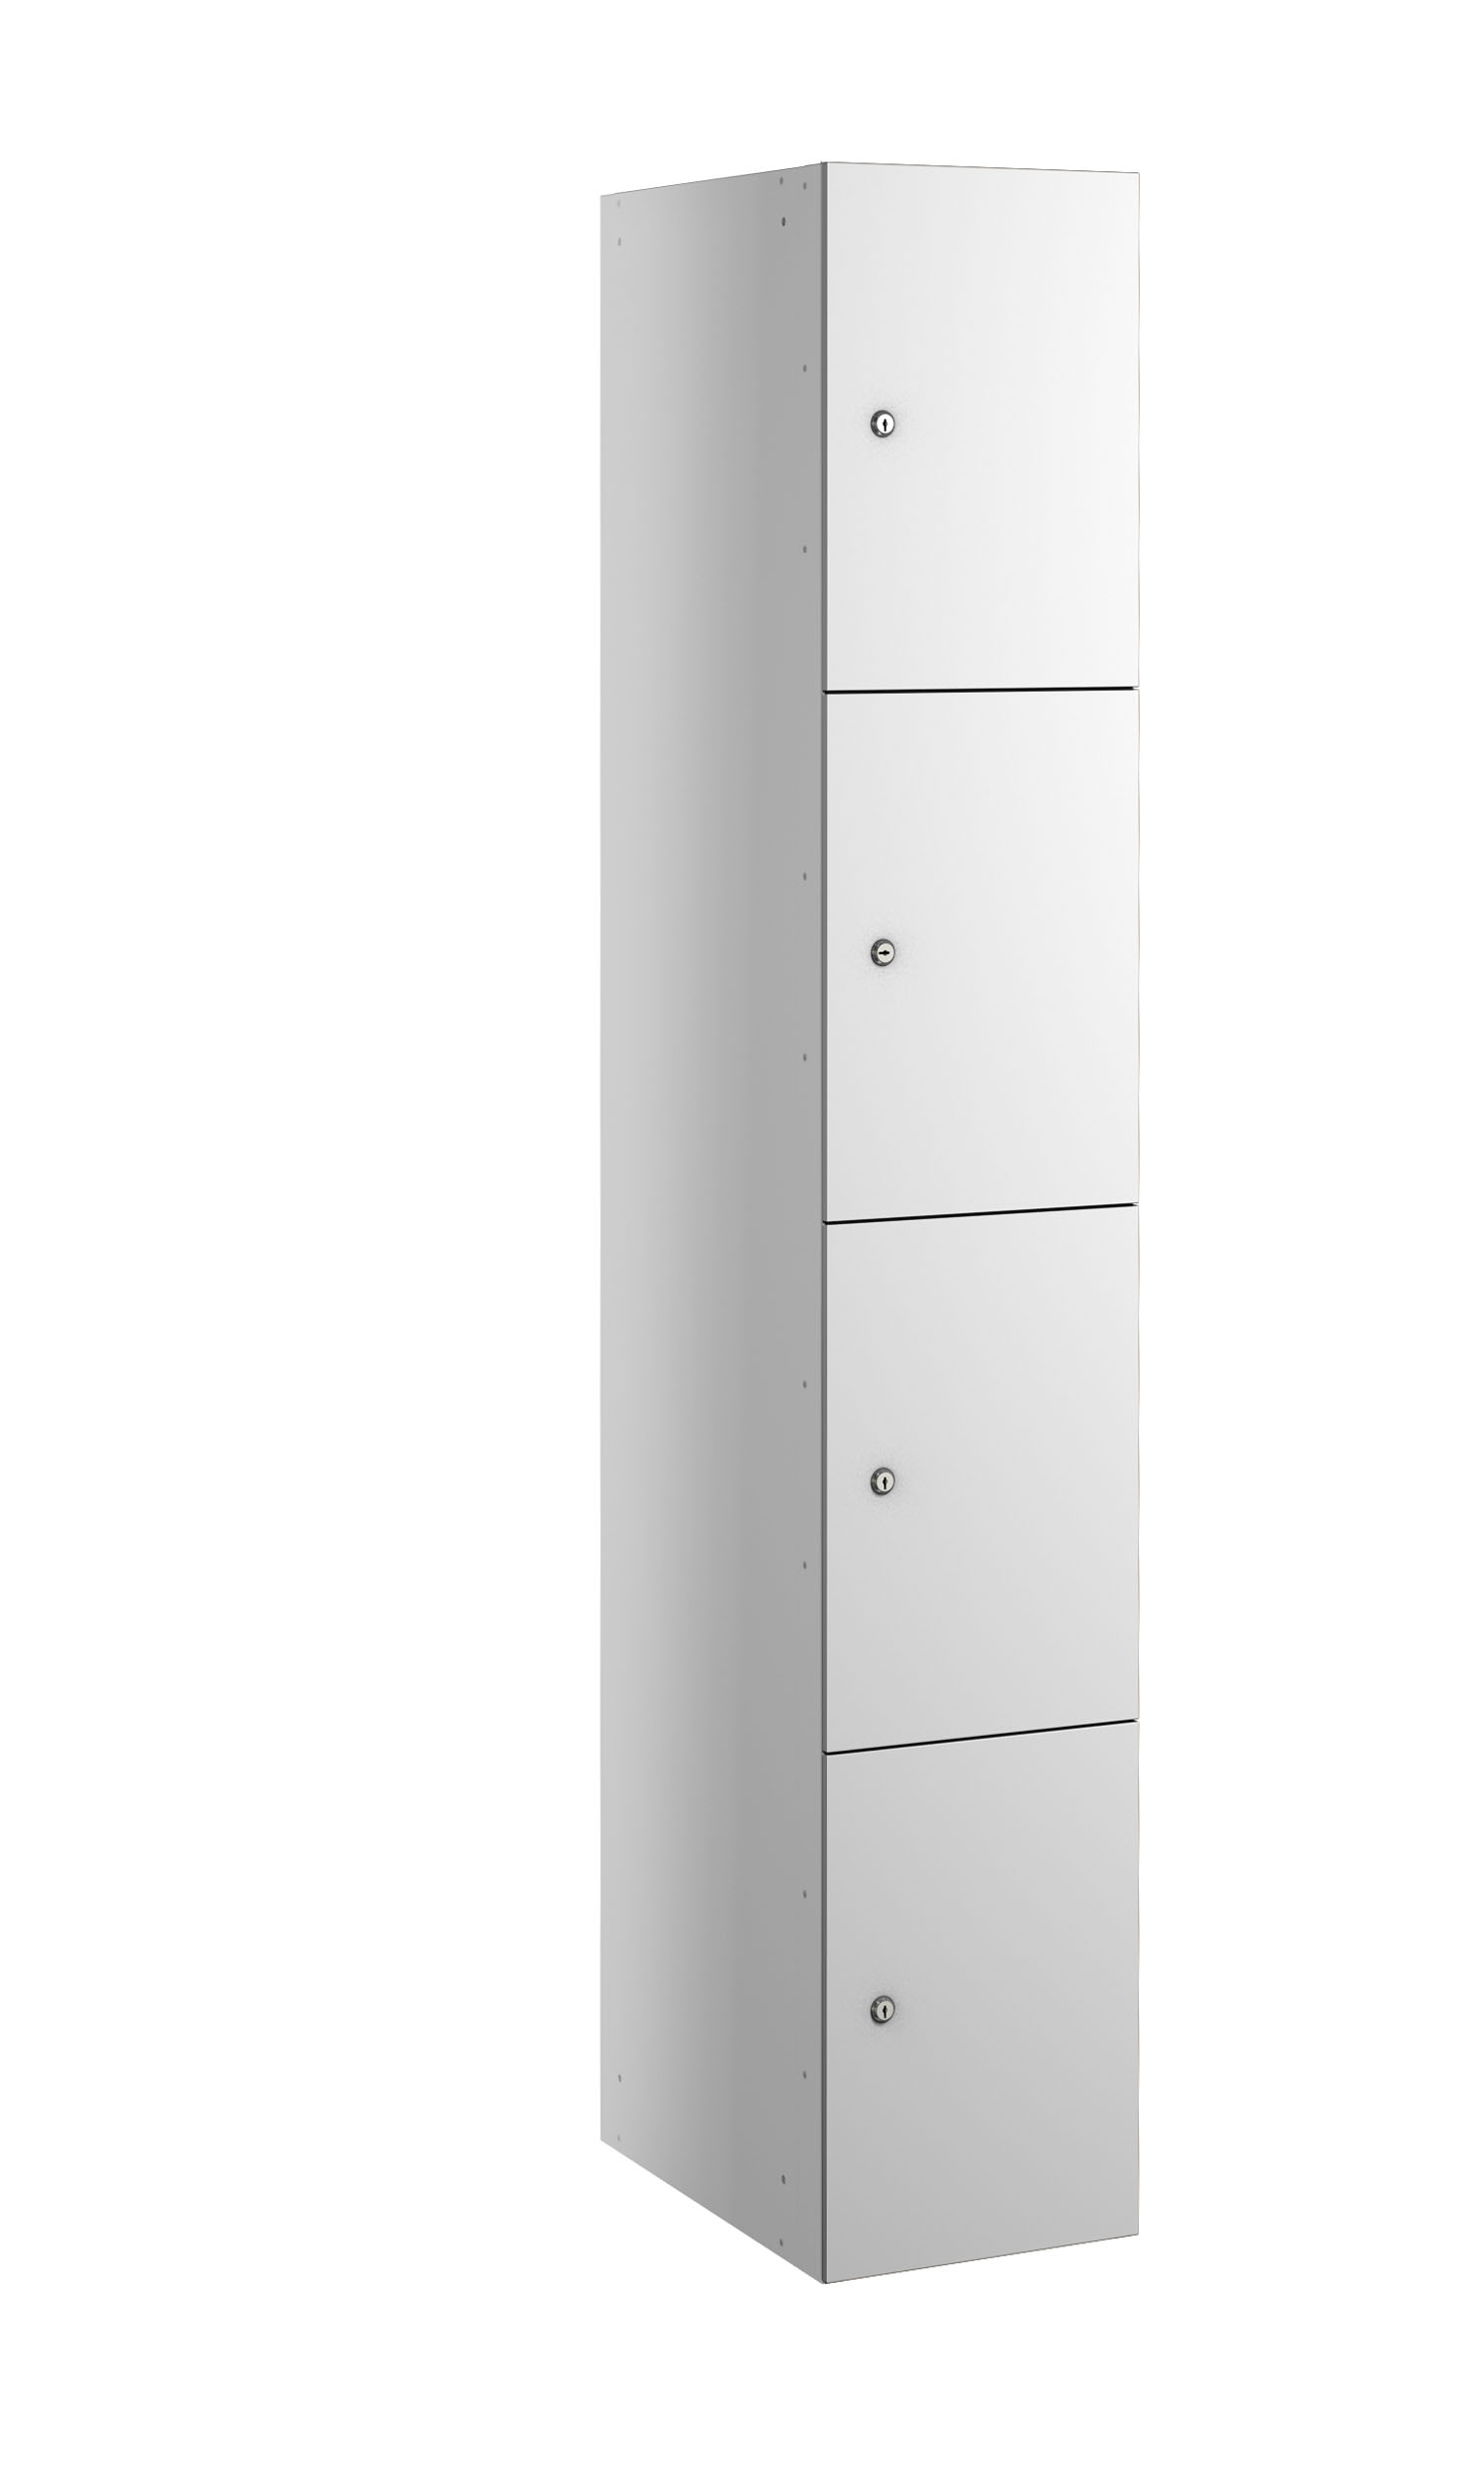 Probe buzzbox laminate 4 doors white